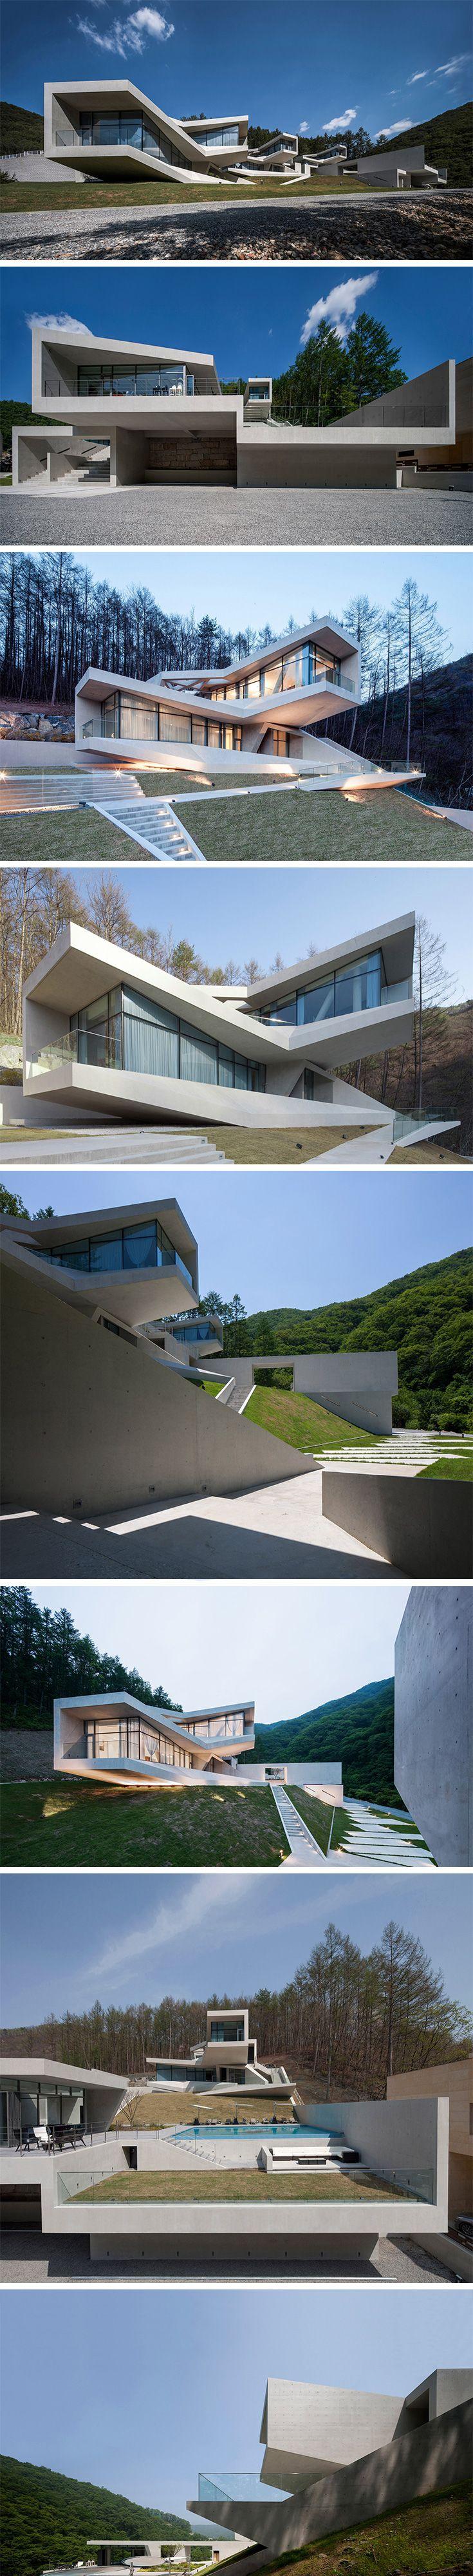 U Retreat by studio IDMM Architects.